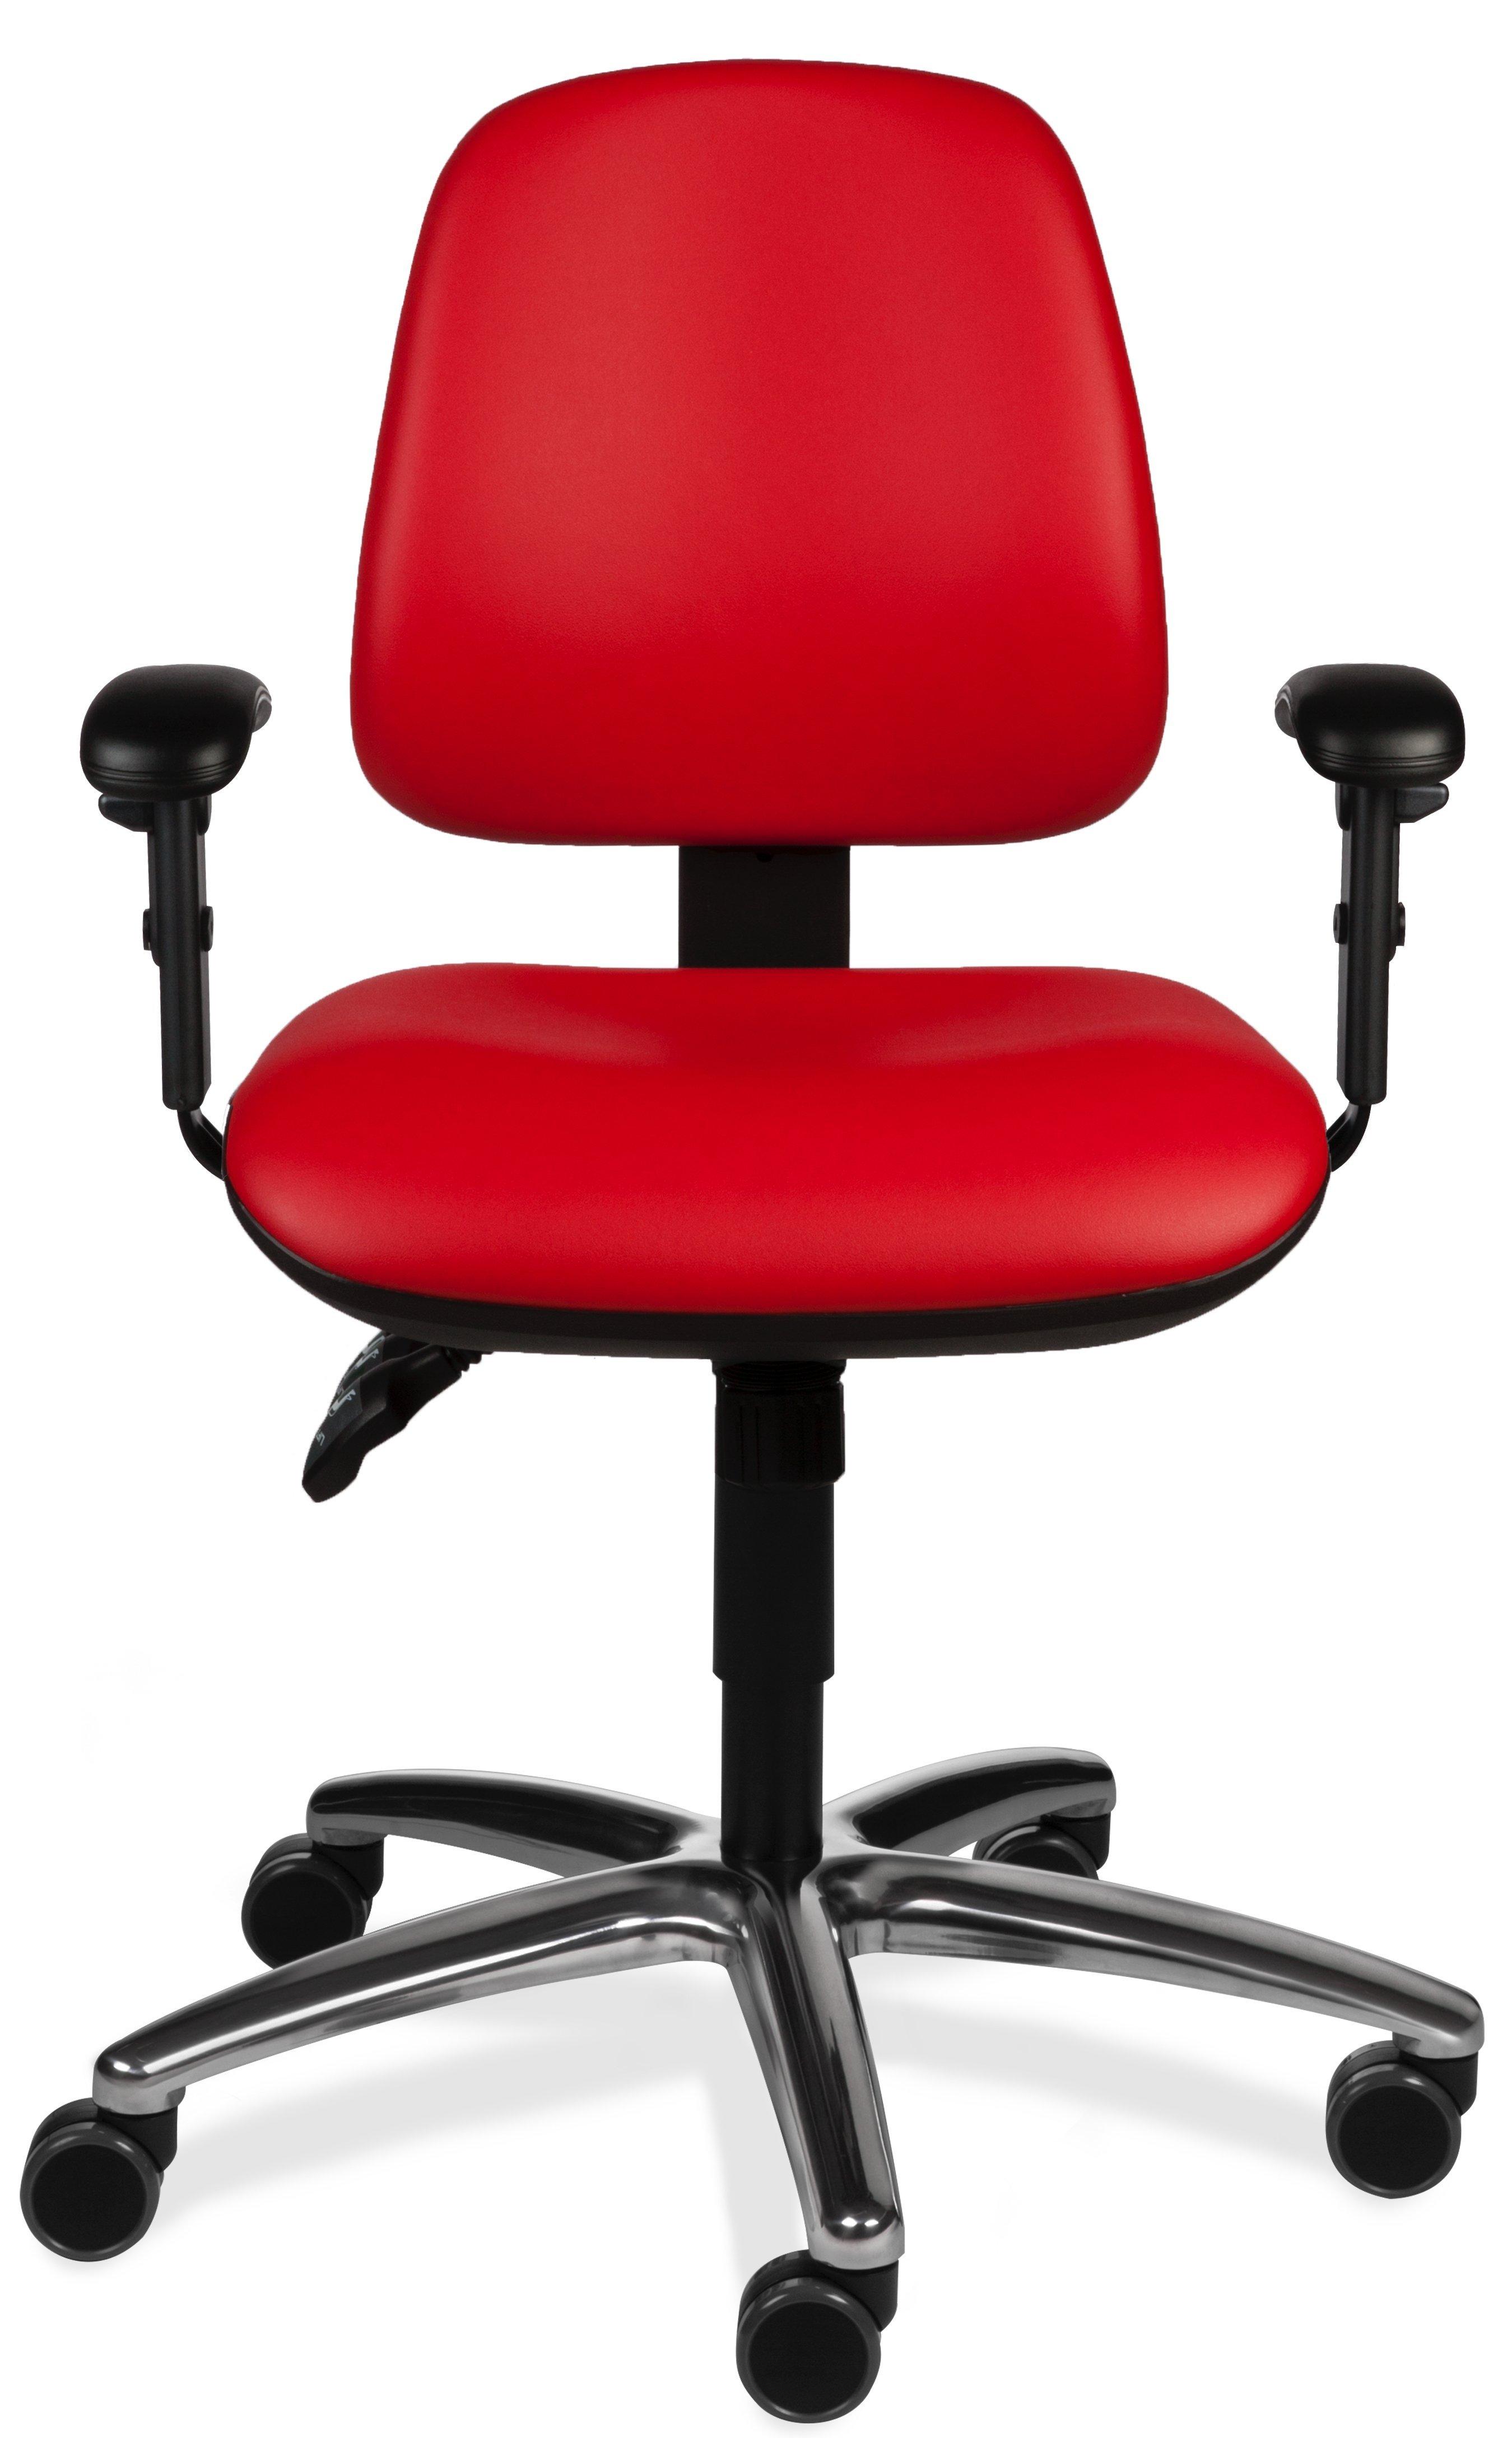 Tex 6510 Stamskin rood